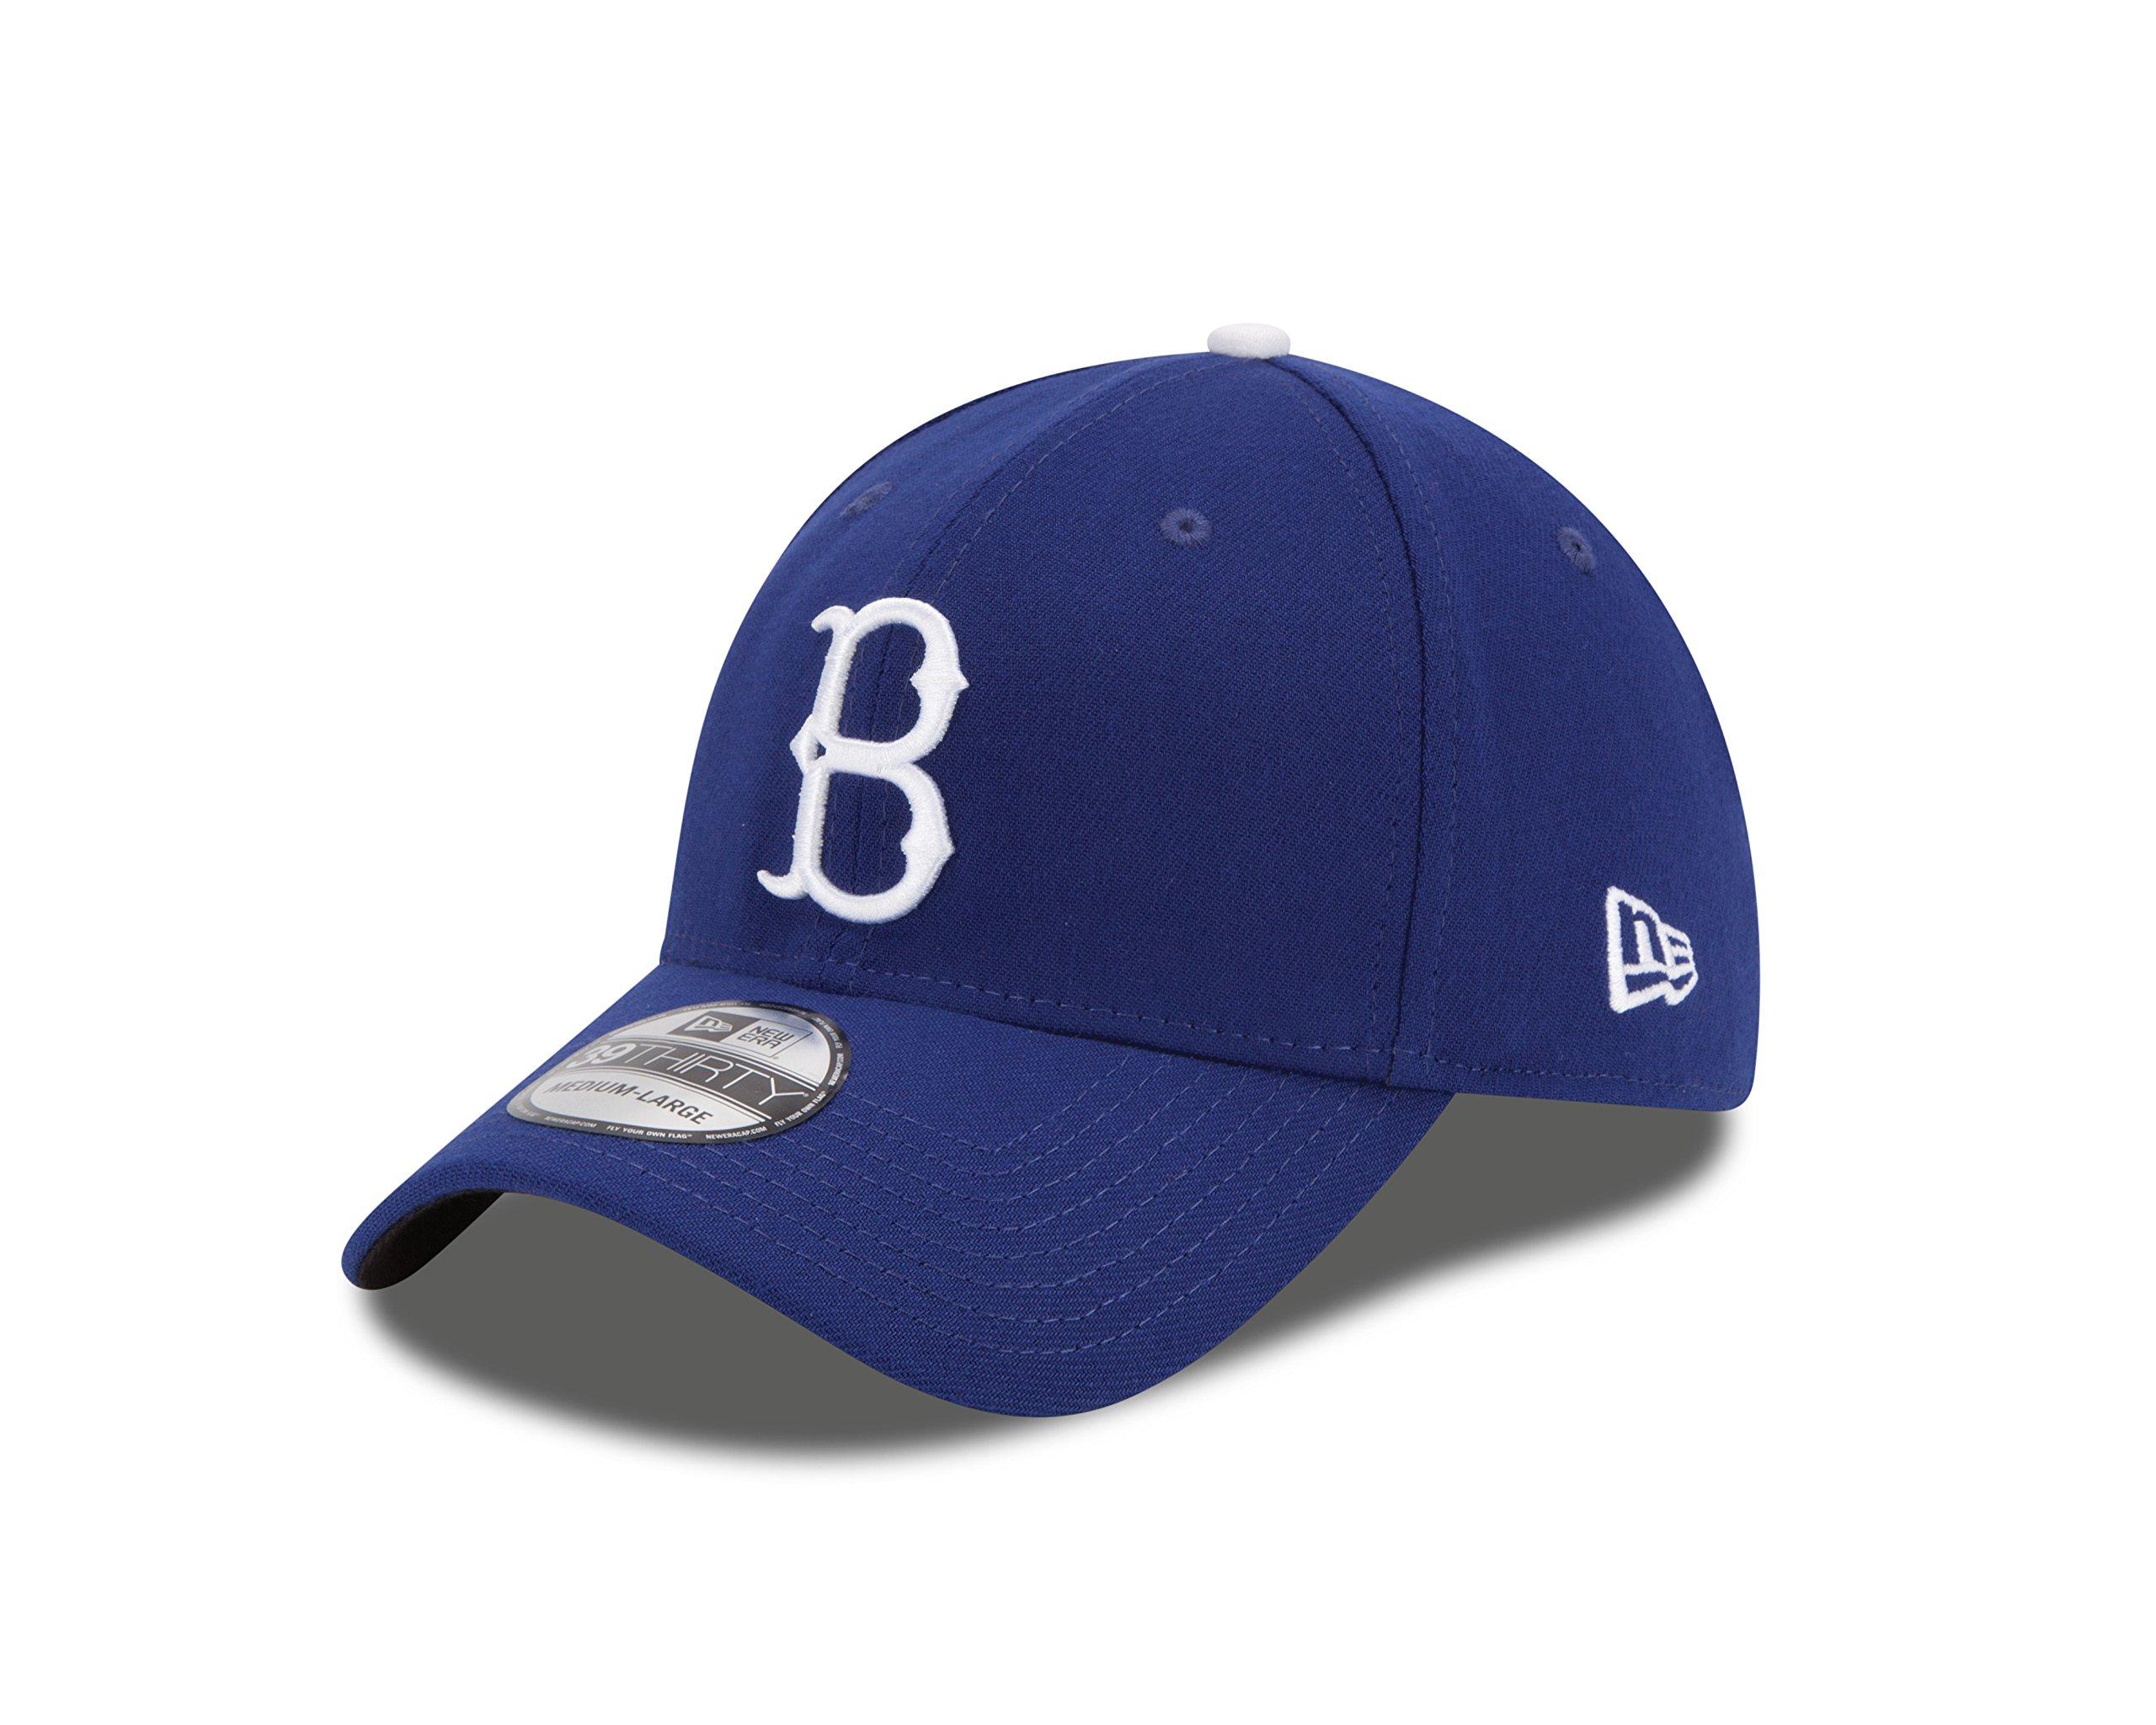 New Era Men's Brooklyn Dodgers, Royal, Small/Medium by New Era